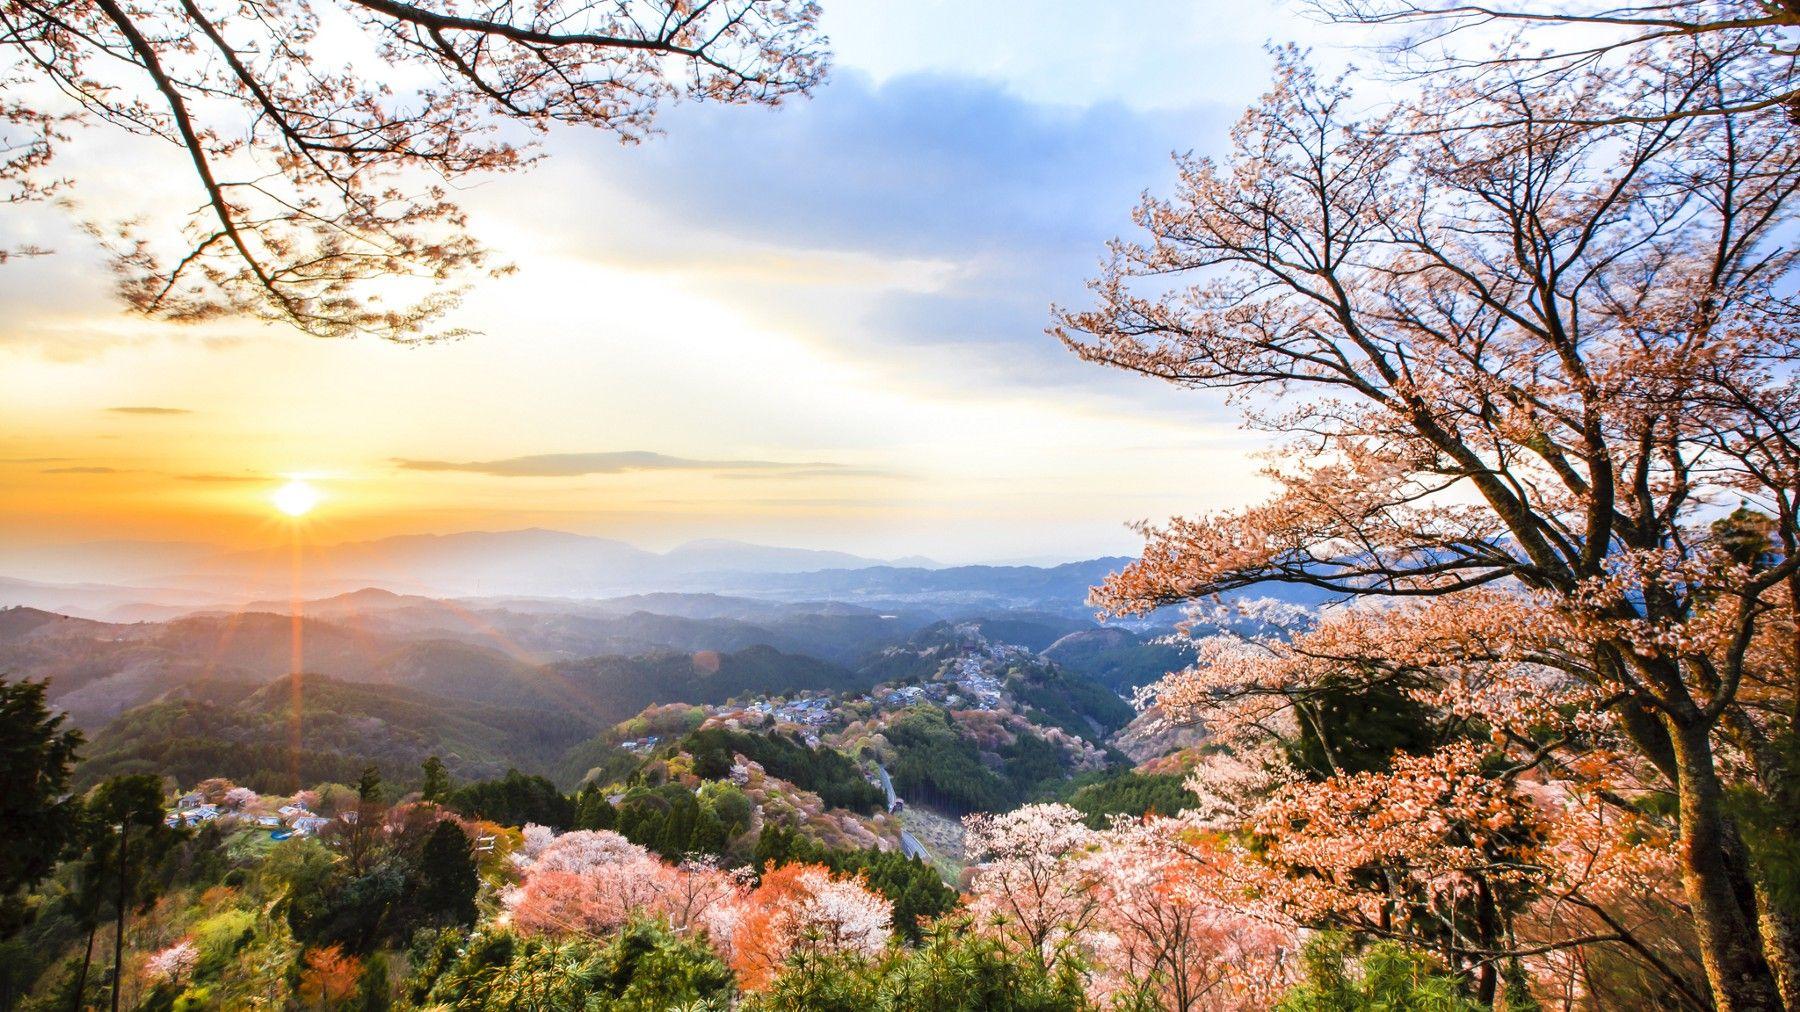 Cherry blossoms at Mount Yoshino, Nara Prefecture, Japan